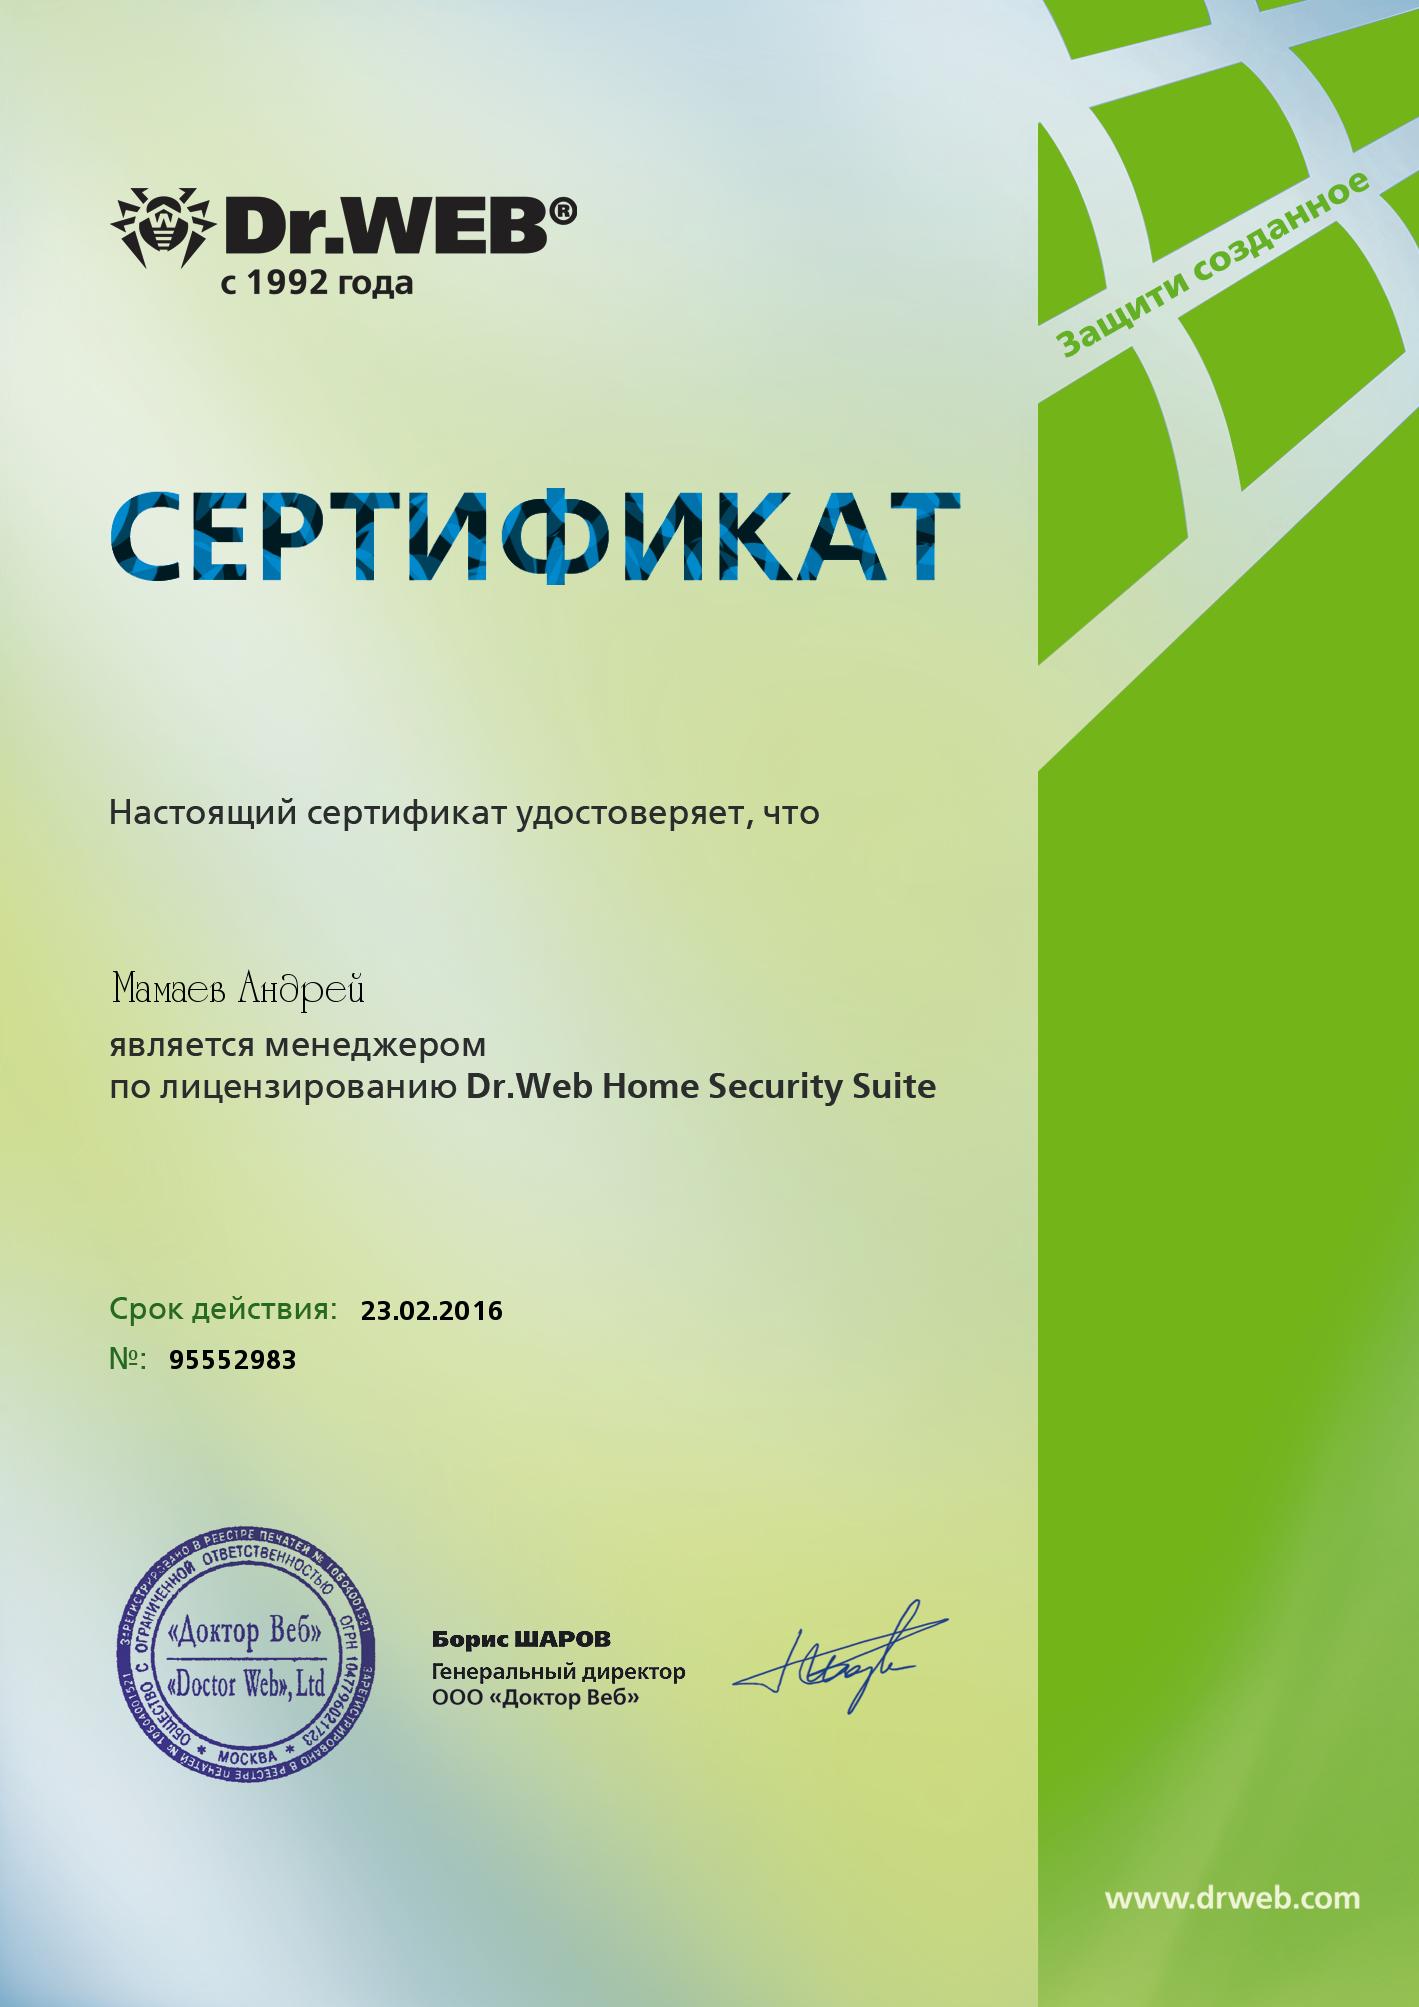 (DWCERT-020-3) Менеджер по лицензированию Dr.Web Home Security Suite (Мамаев) 23.02.2016